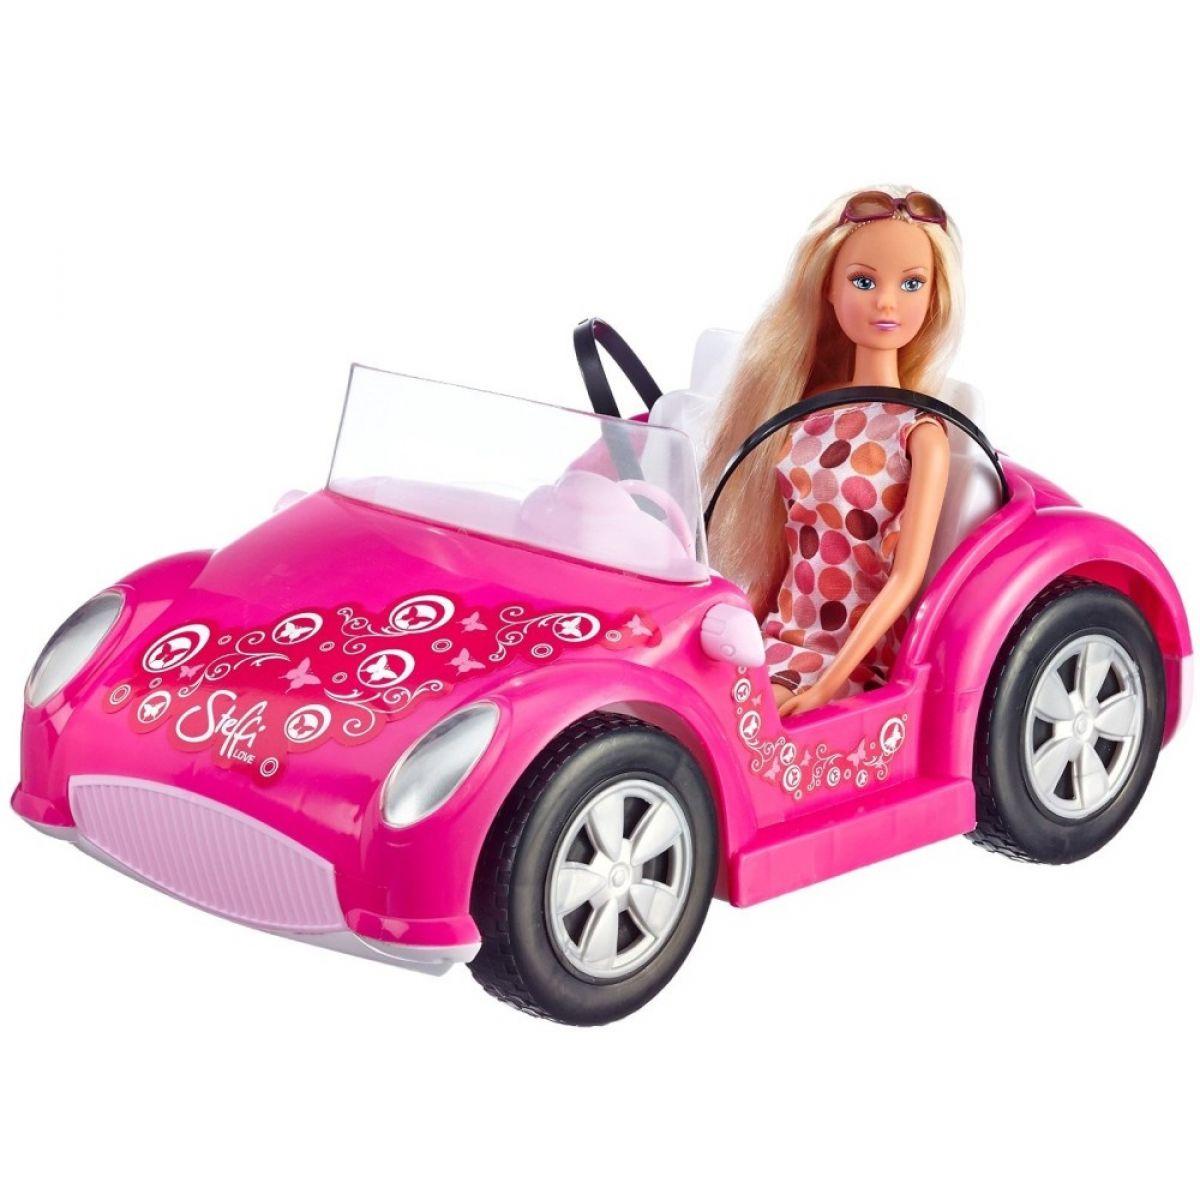 Steffi Love Girls Panenka v kabrioletu - Poškozený obal